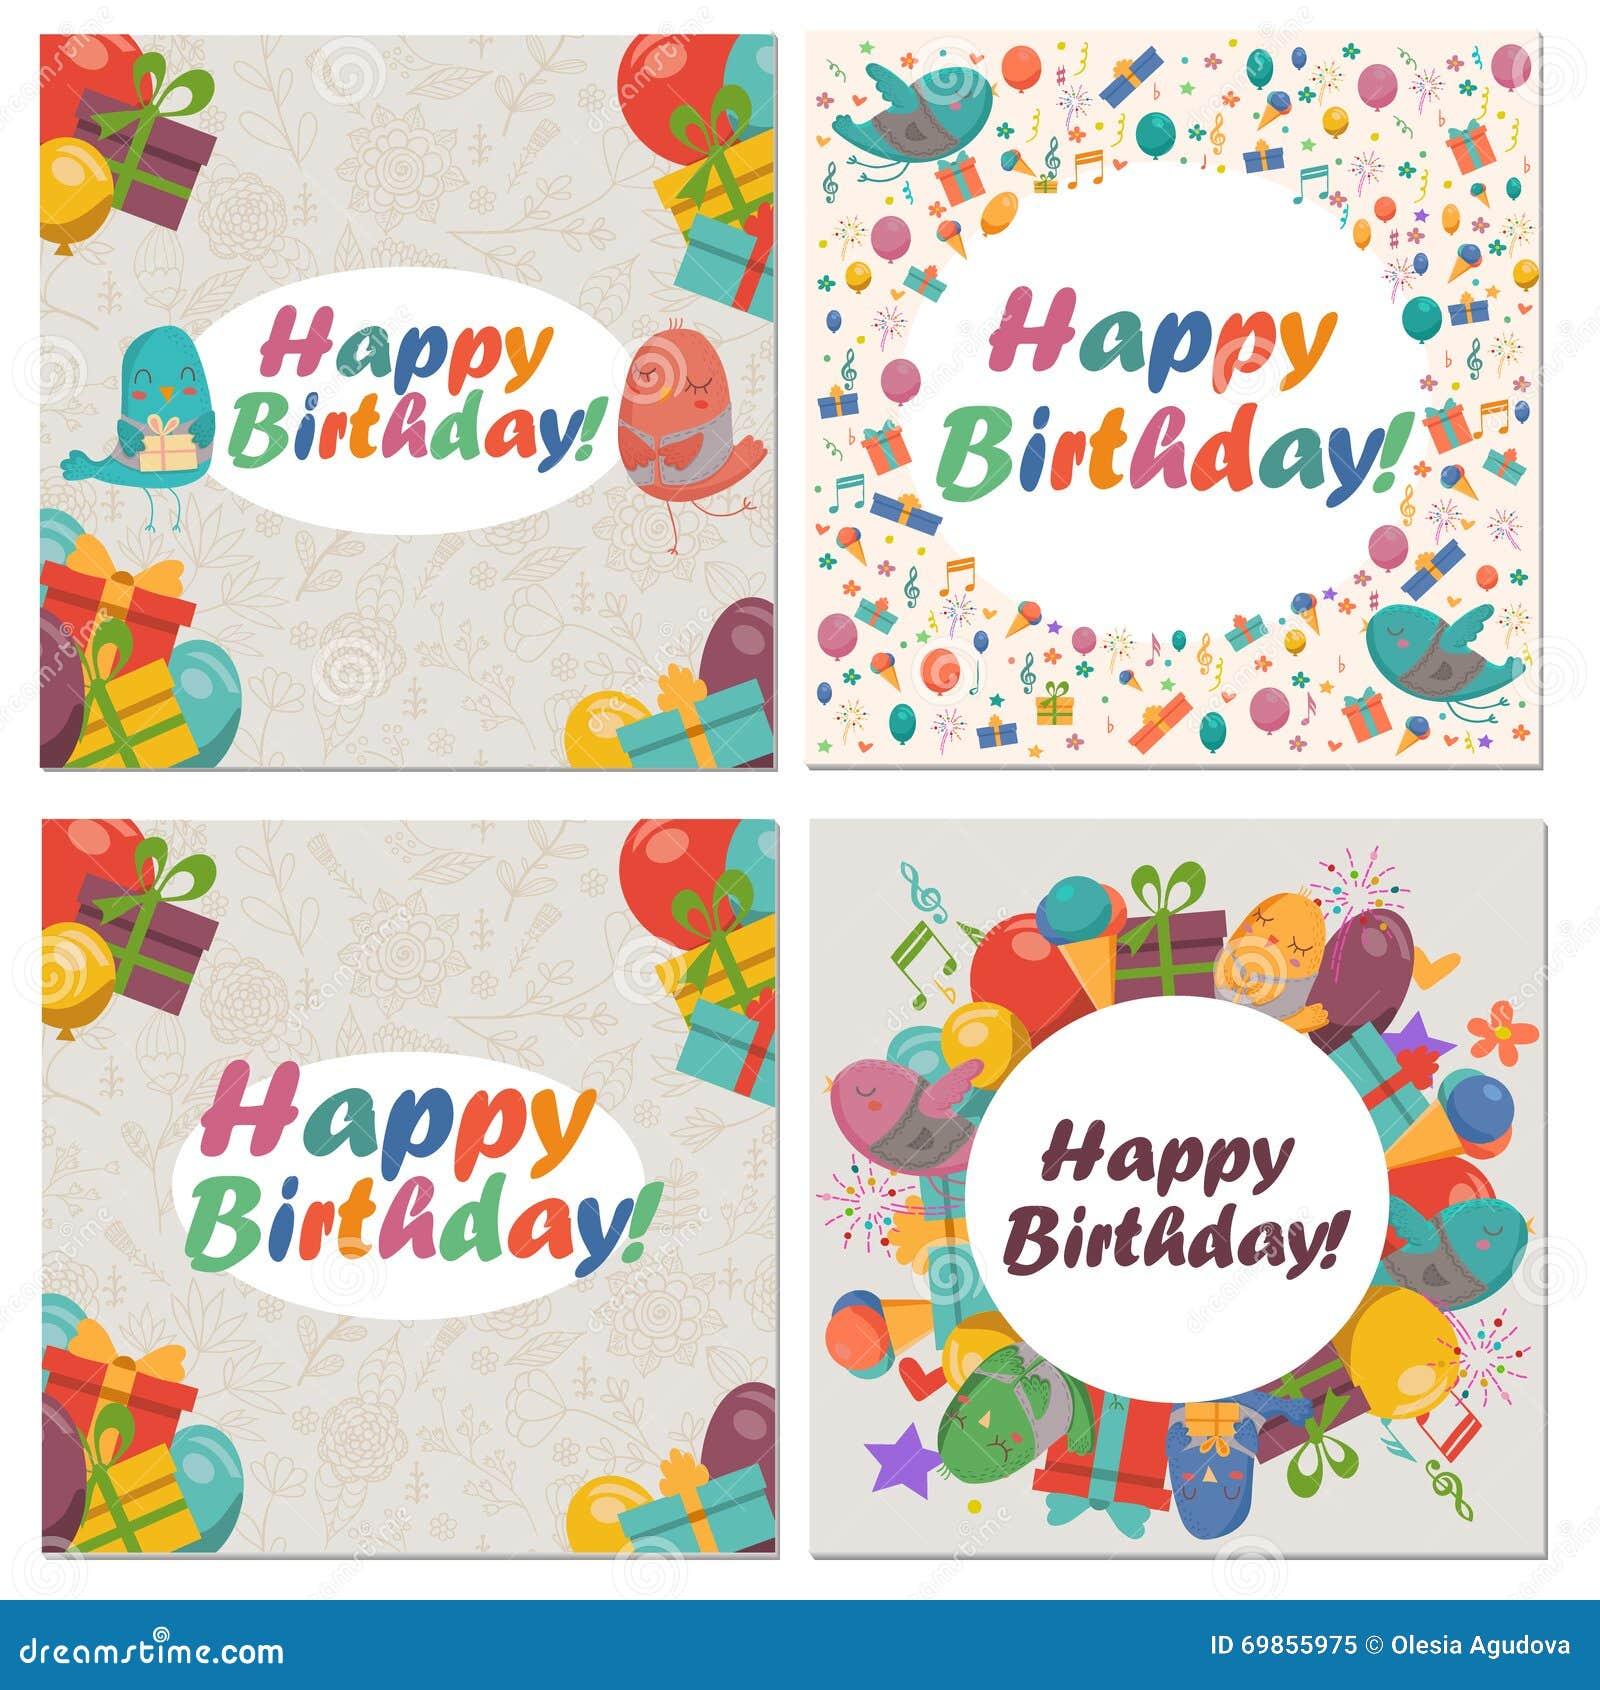 Set of birthday card with cute birdsflowers and balloonsice cream set of birthday card with cute birdsflowers and balloonsice cream gifts izmirmasajfo